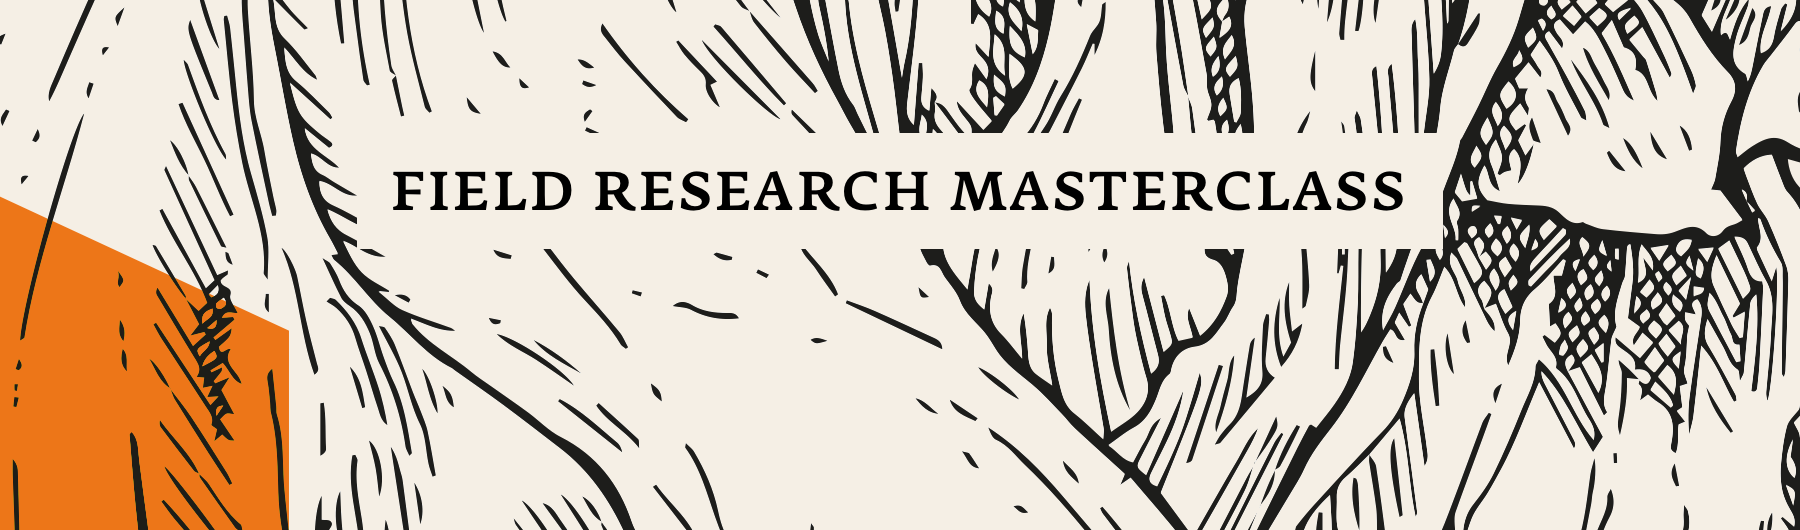 Jan Chipchase - Field Research Masterclass, Sydney, November 29